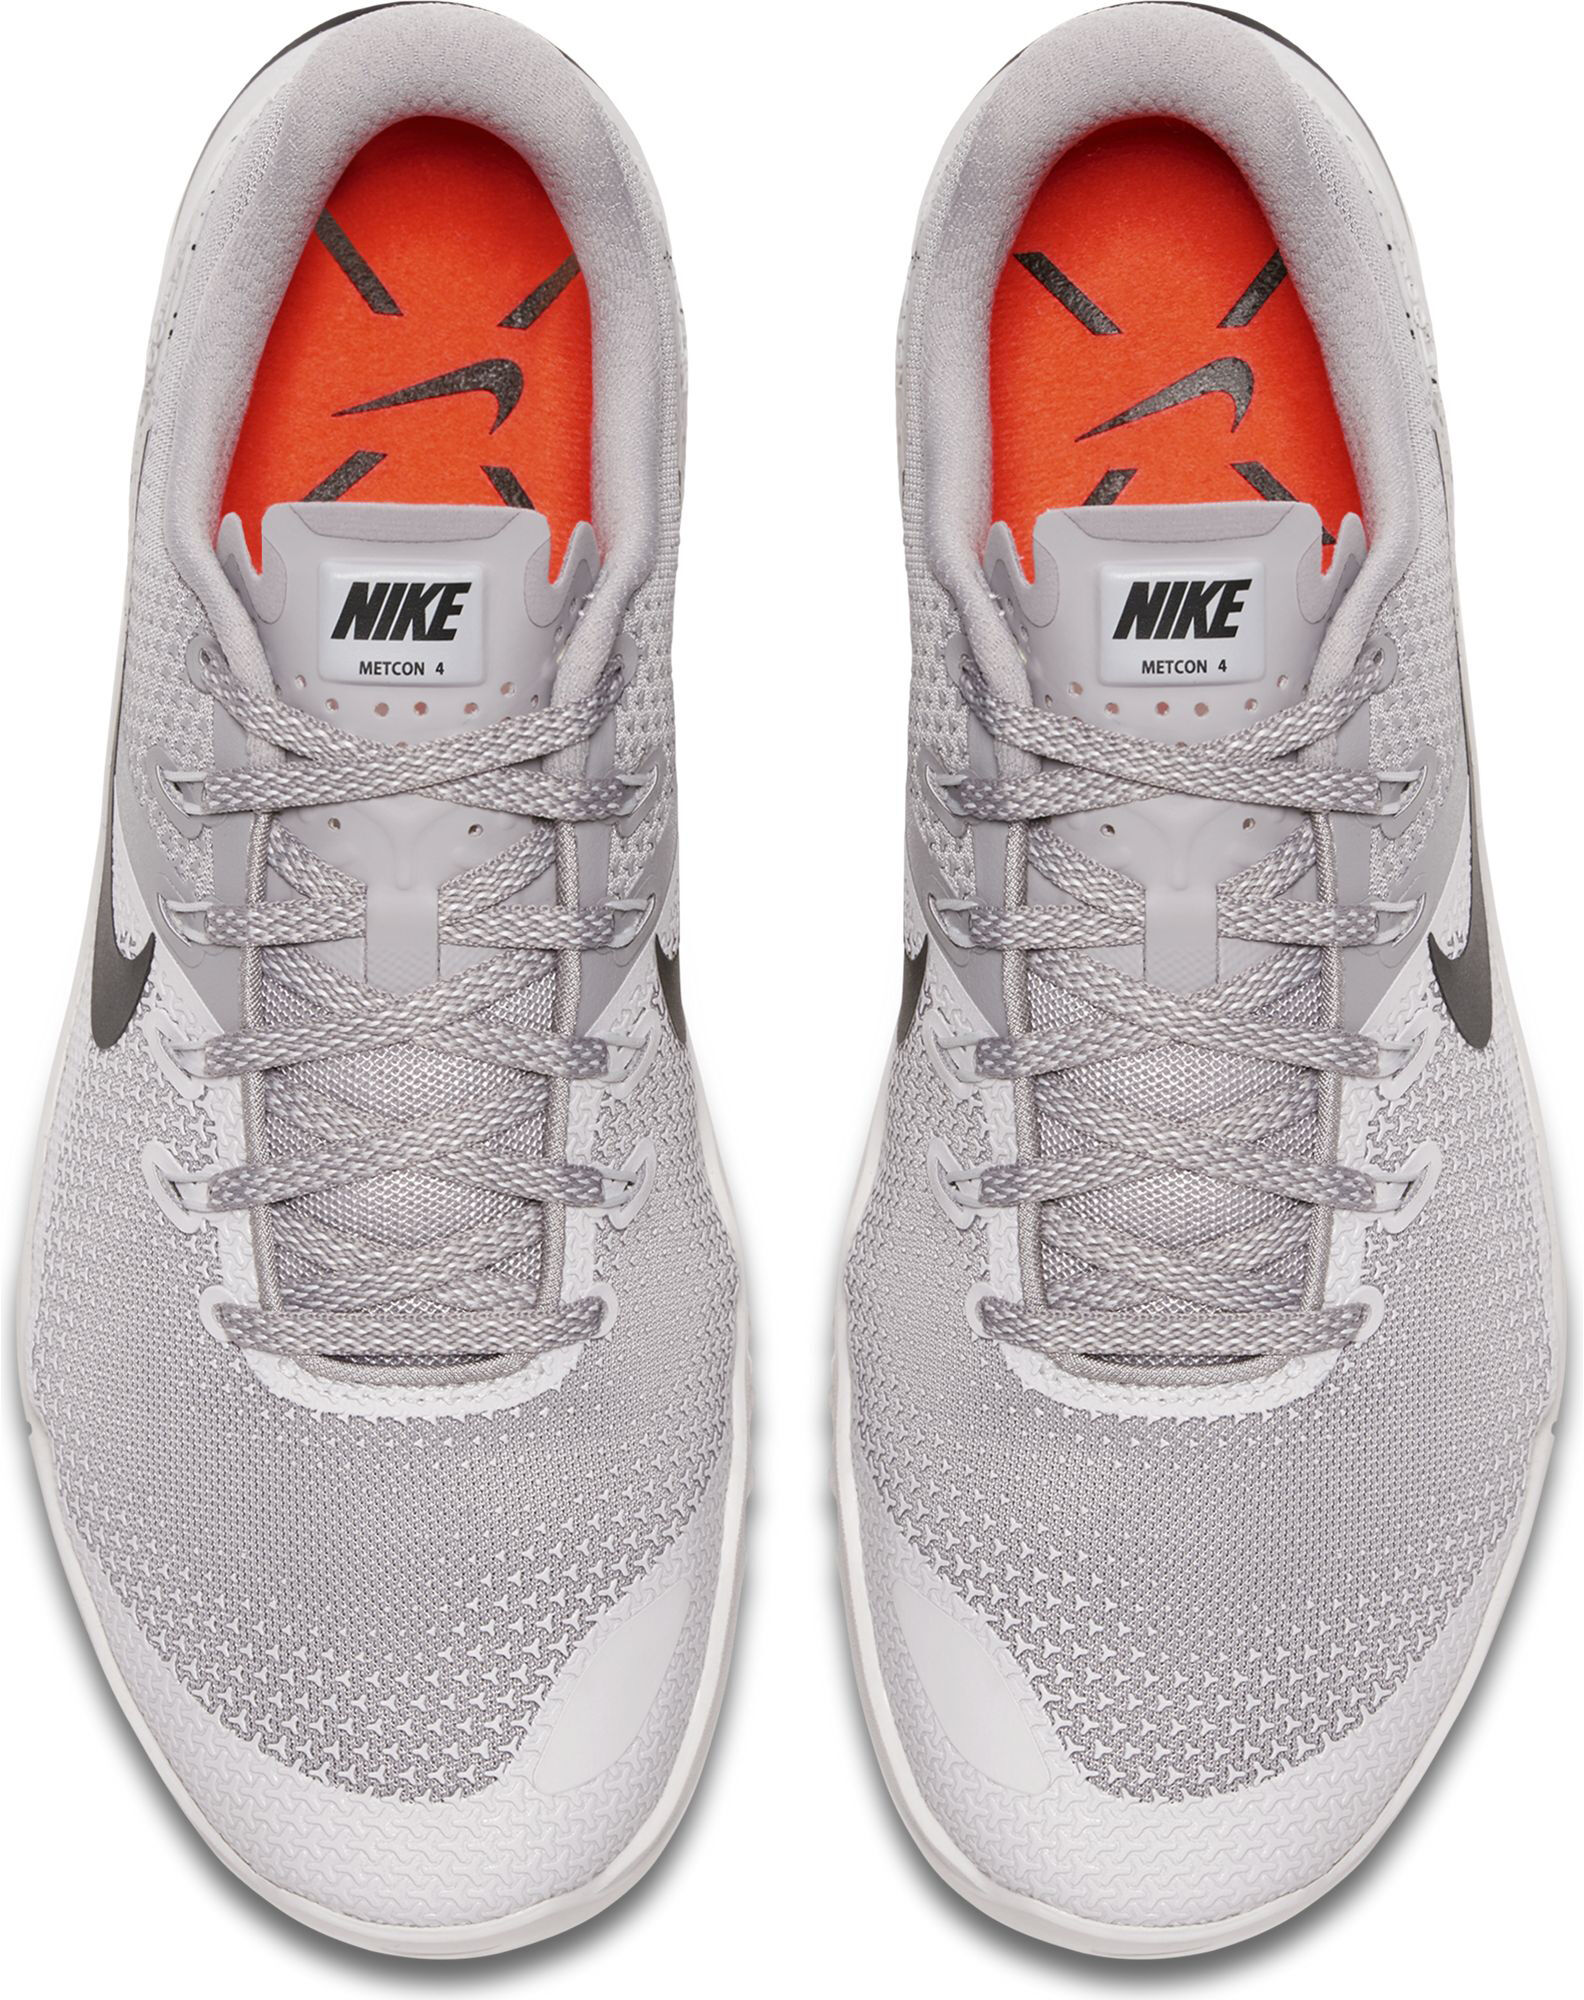 reputable site 7f377 9f566 Nike Hombre 4 Nike Metcon Metcon 5xHSqR